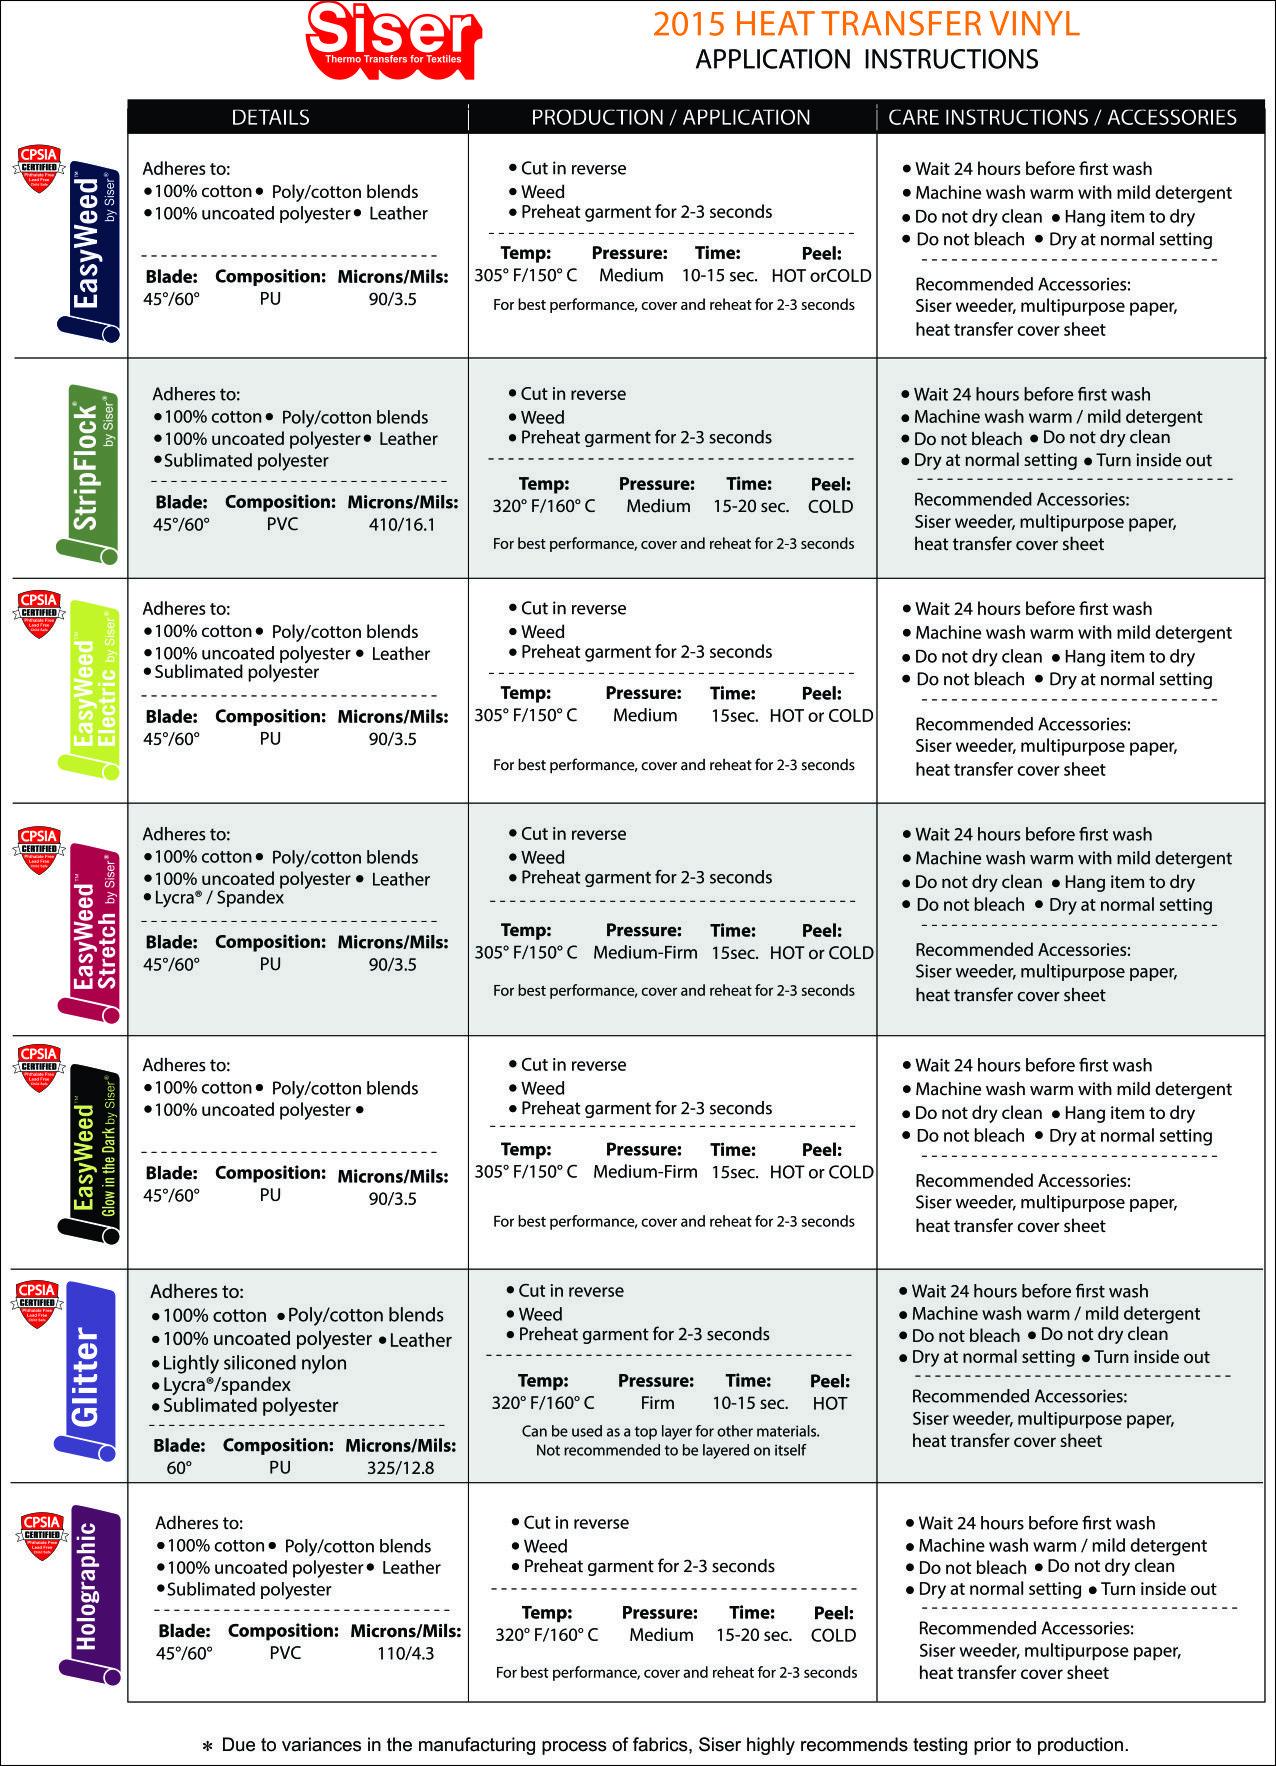 Craftcuttersupply com heat transfer vinyl application instructions